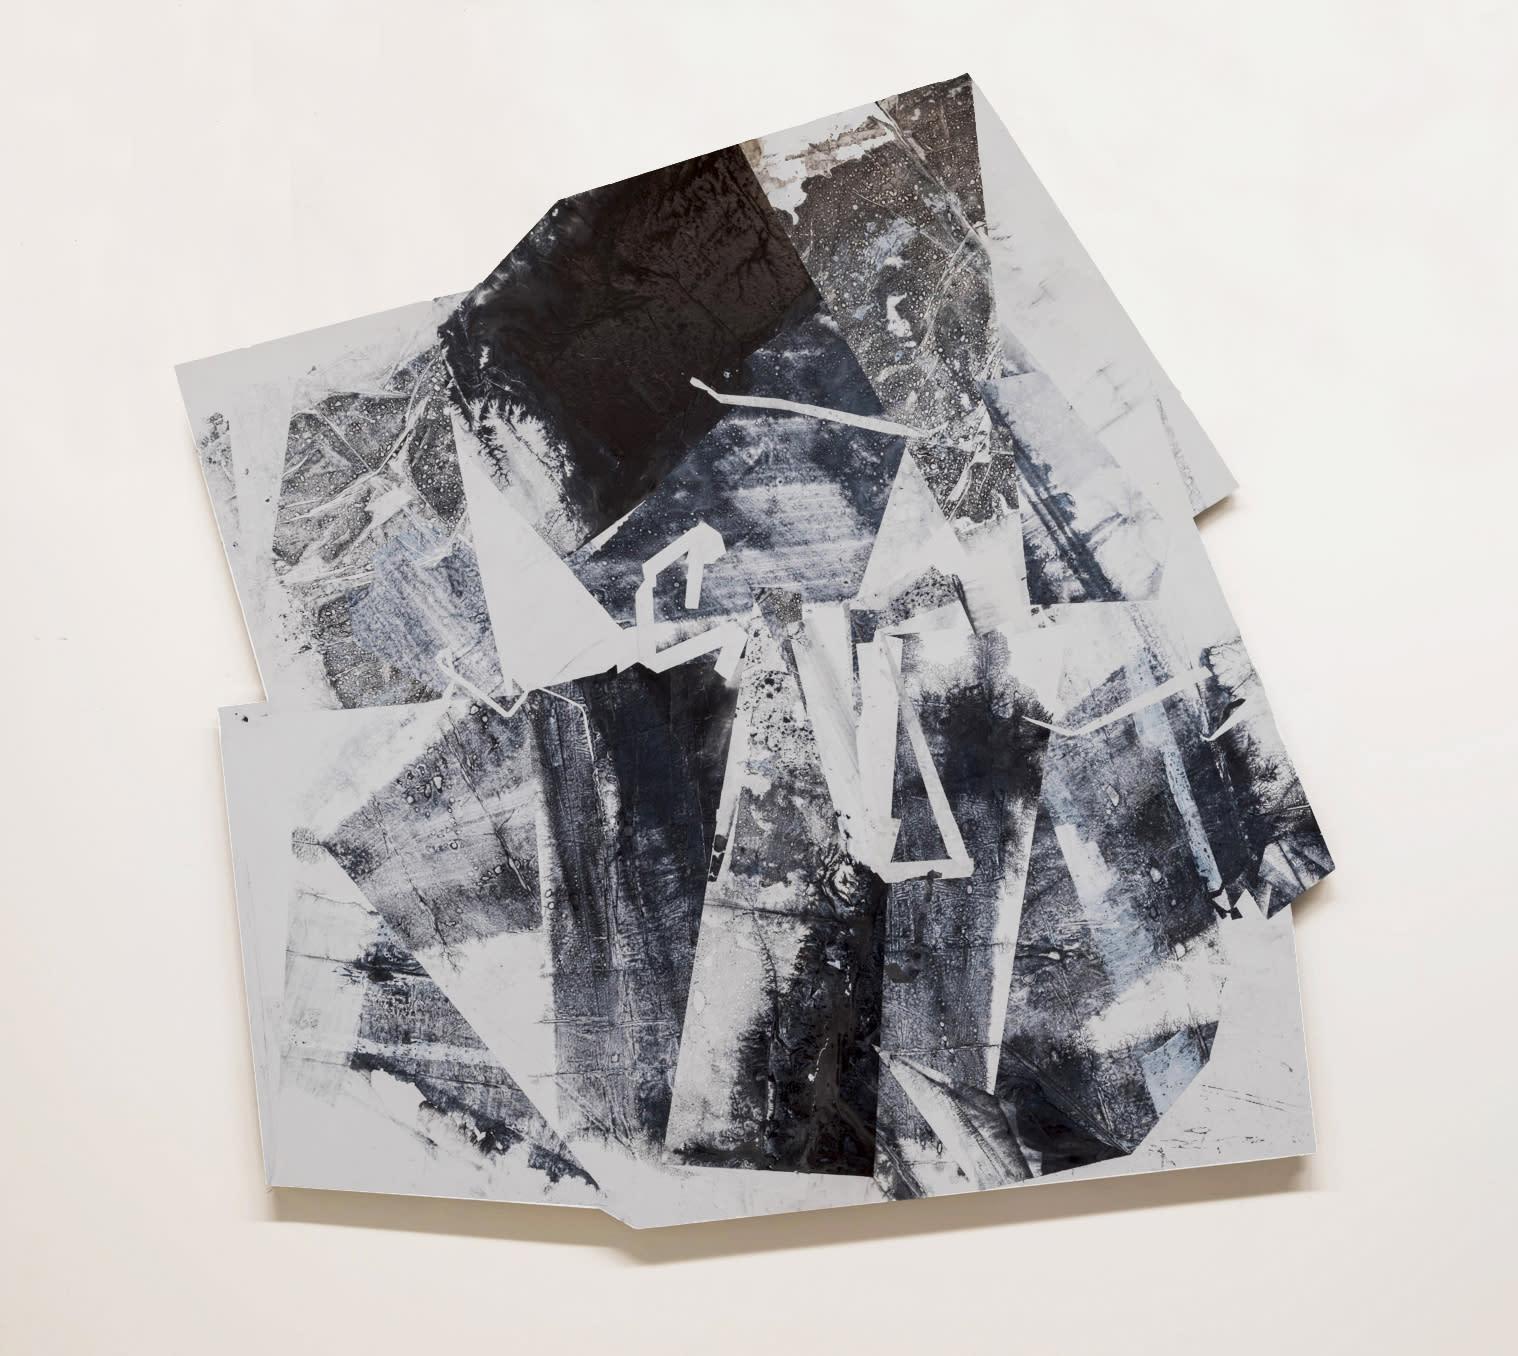 Zheng Chongbin 鄭重賓, Untitled No. 8 無題 (八), 2019